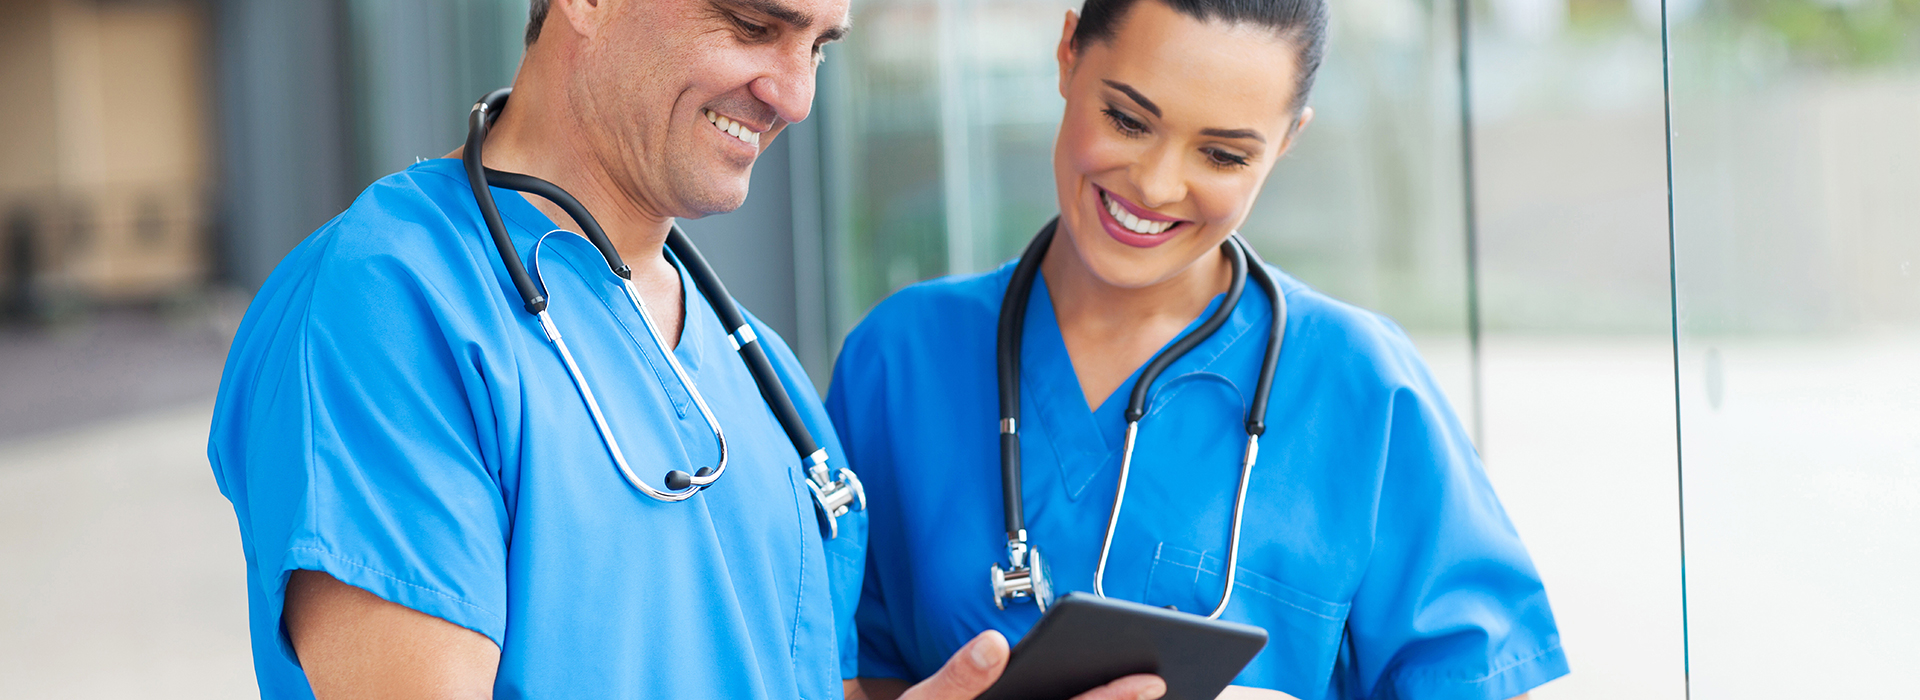 NPs talking about telemedicine practice